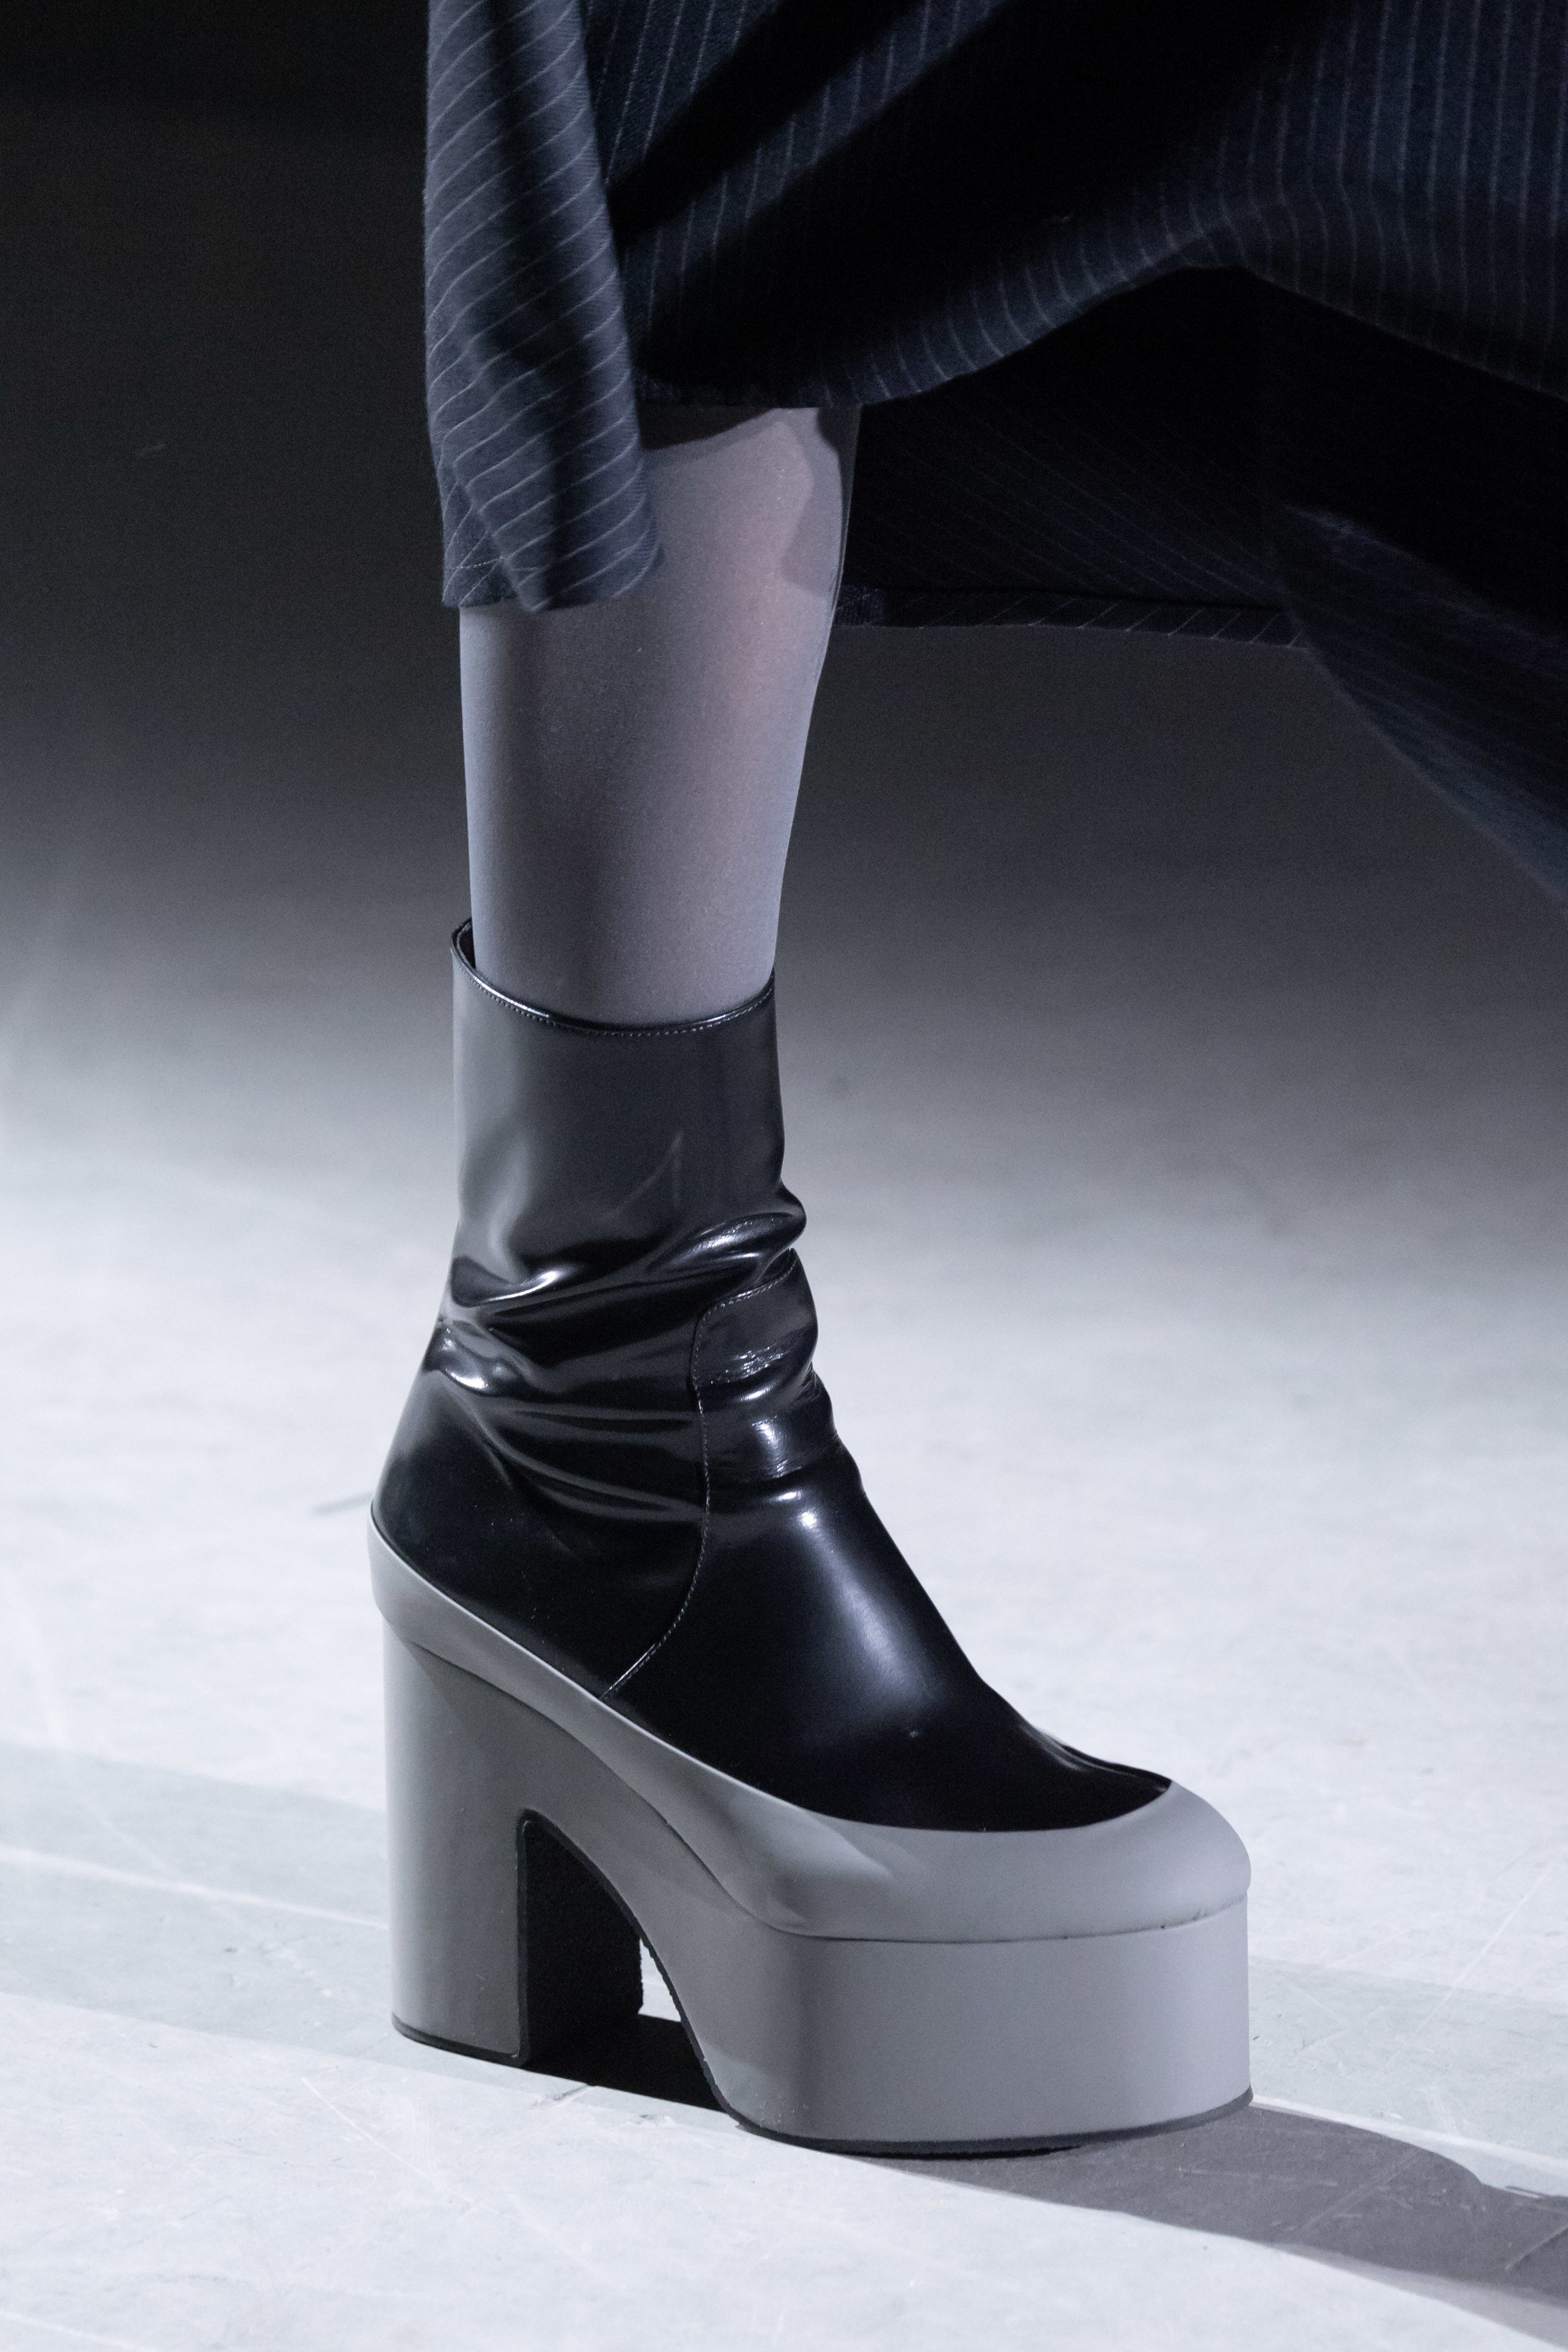 Dries Van Noten Fall 2019 Ready to Wear Fashion Show in 2019